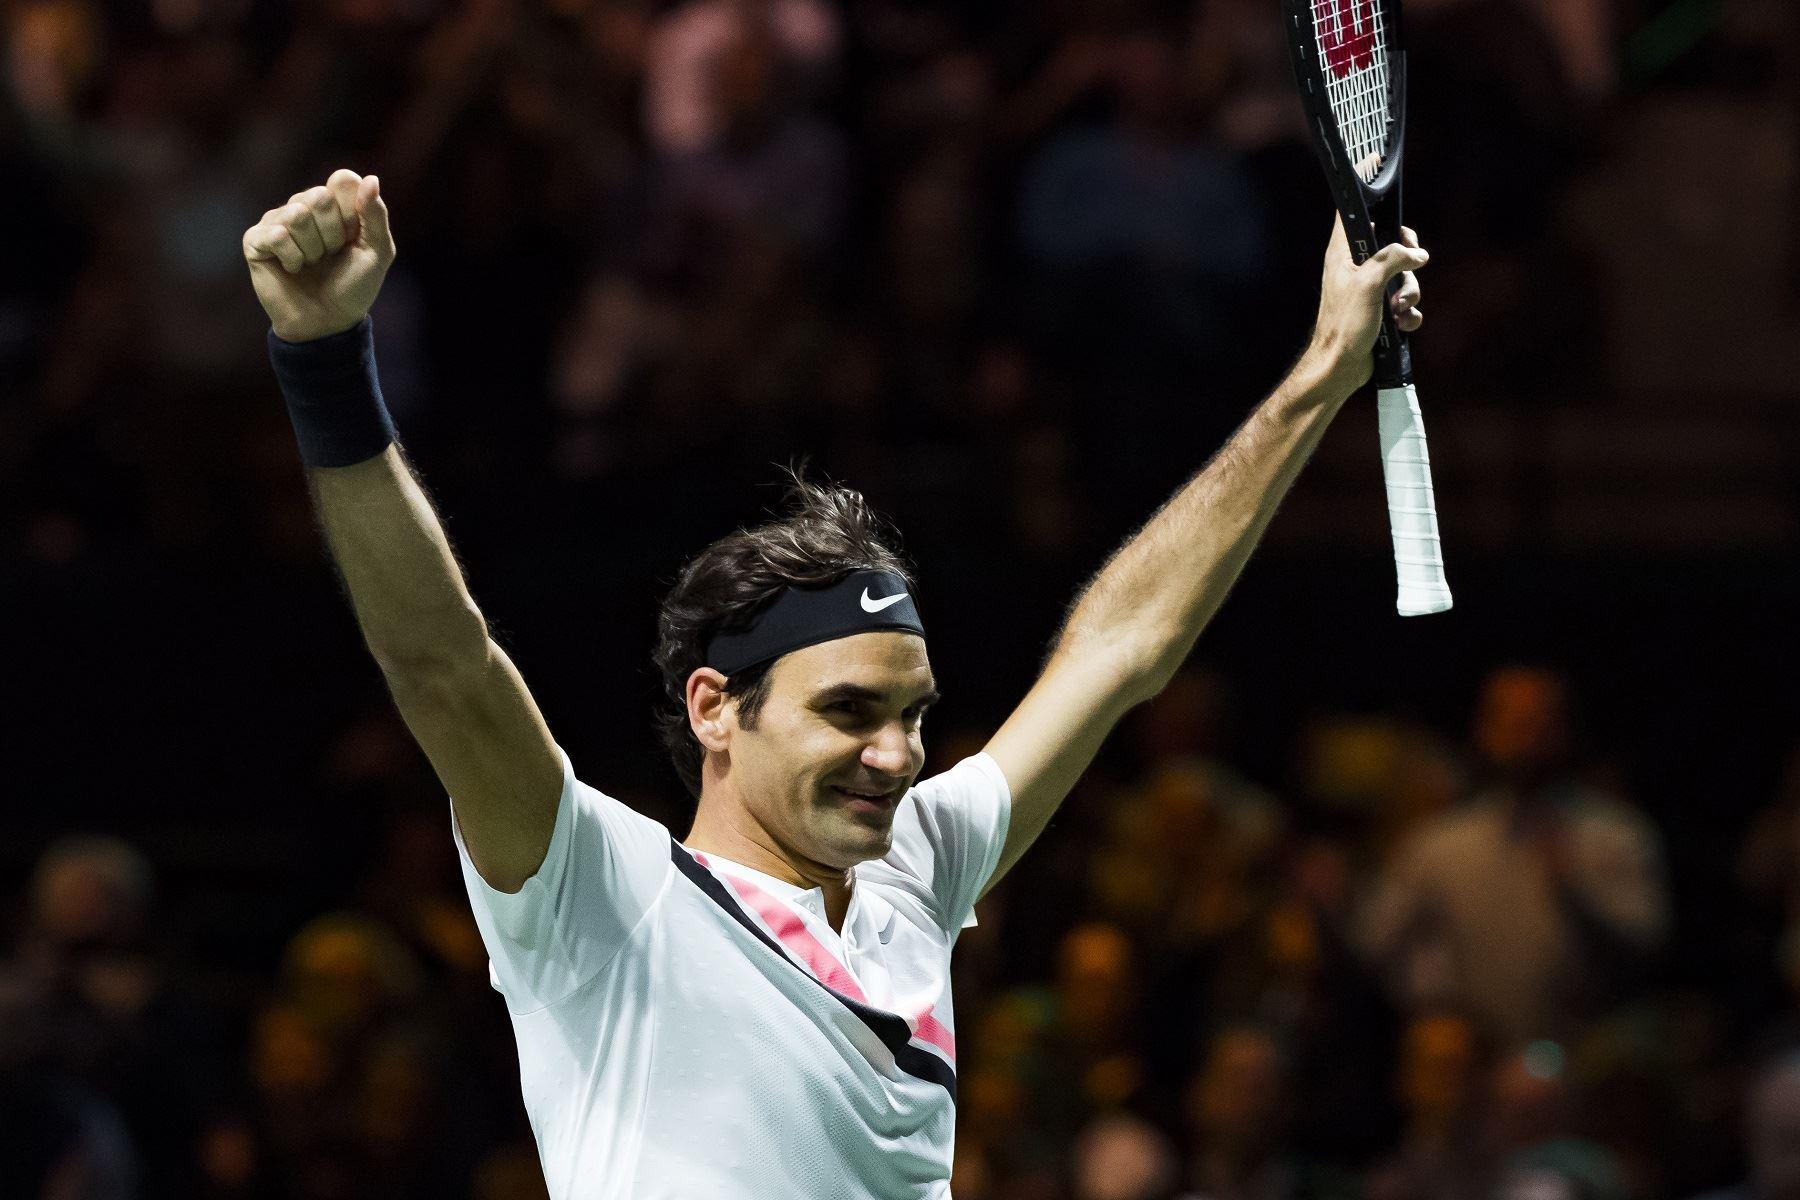 Tenis: Se sorteó el cuadro de Indian Wells